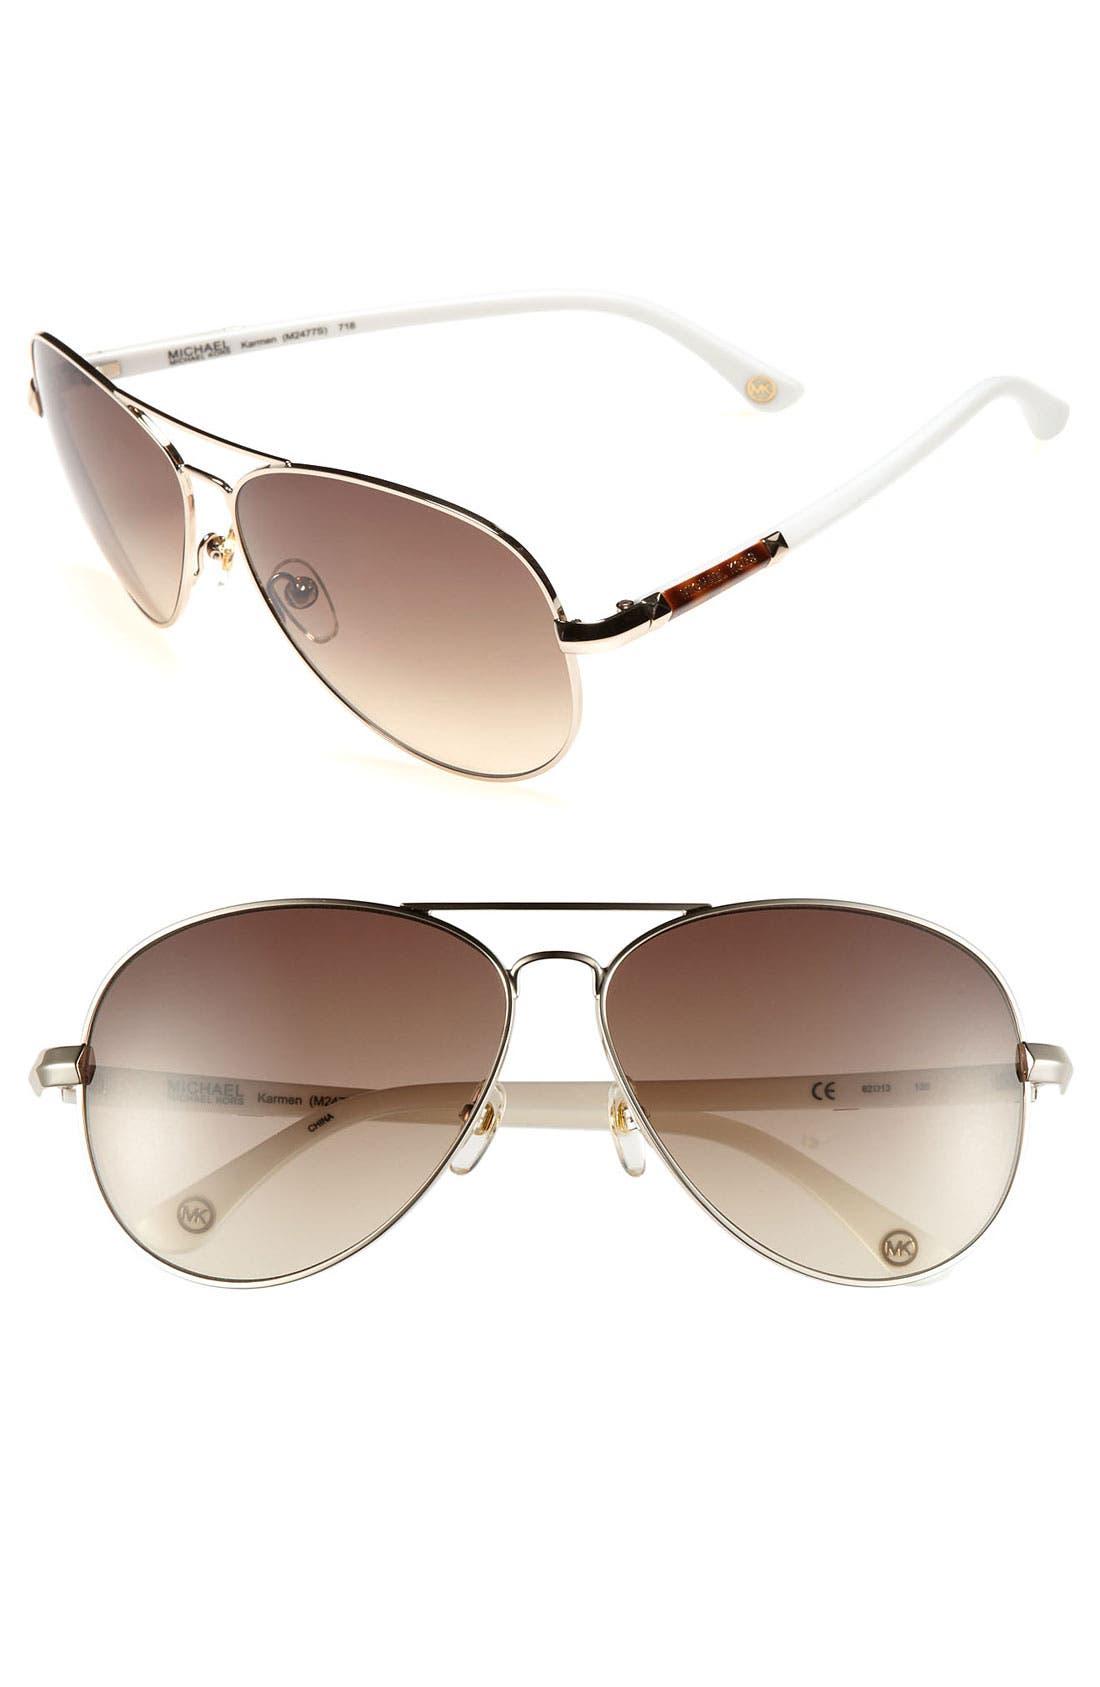 62mm Metal Aviator Sunglasses,                             Main thumbnail 7, color,